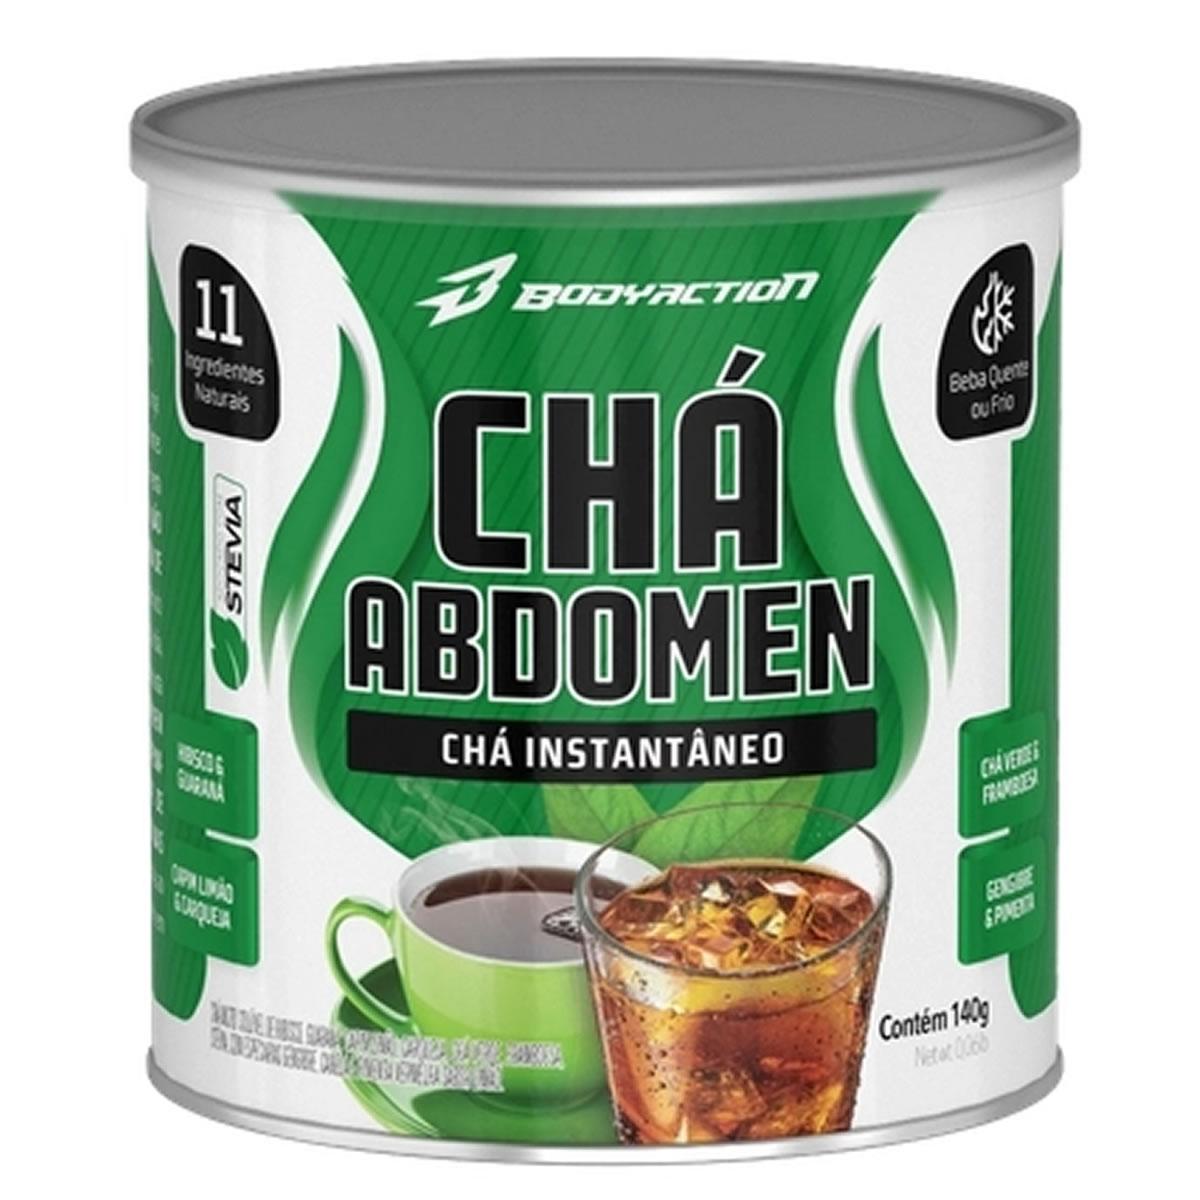 Chá Abdomen 140g - Body Action